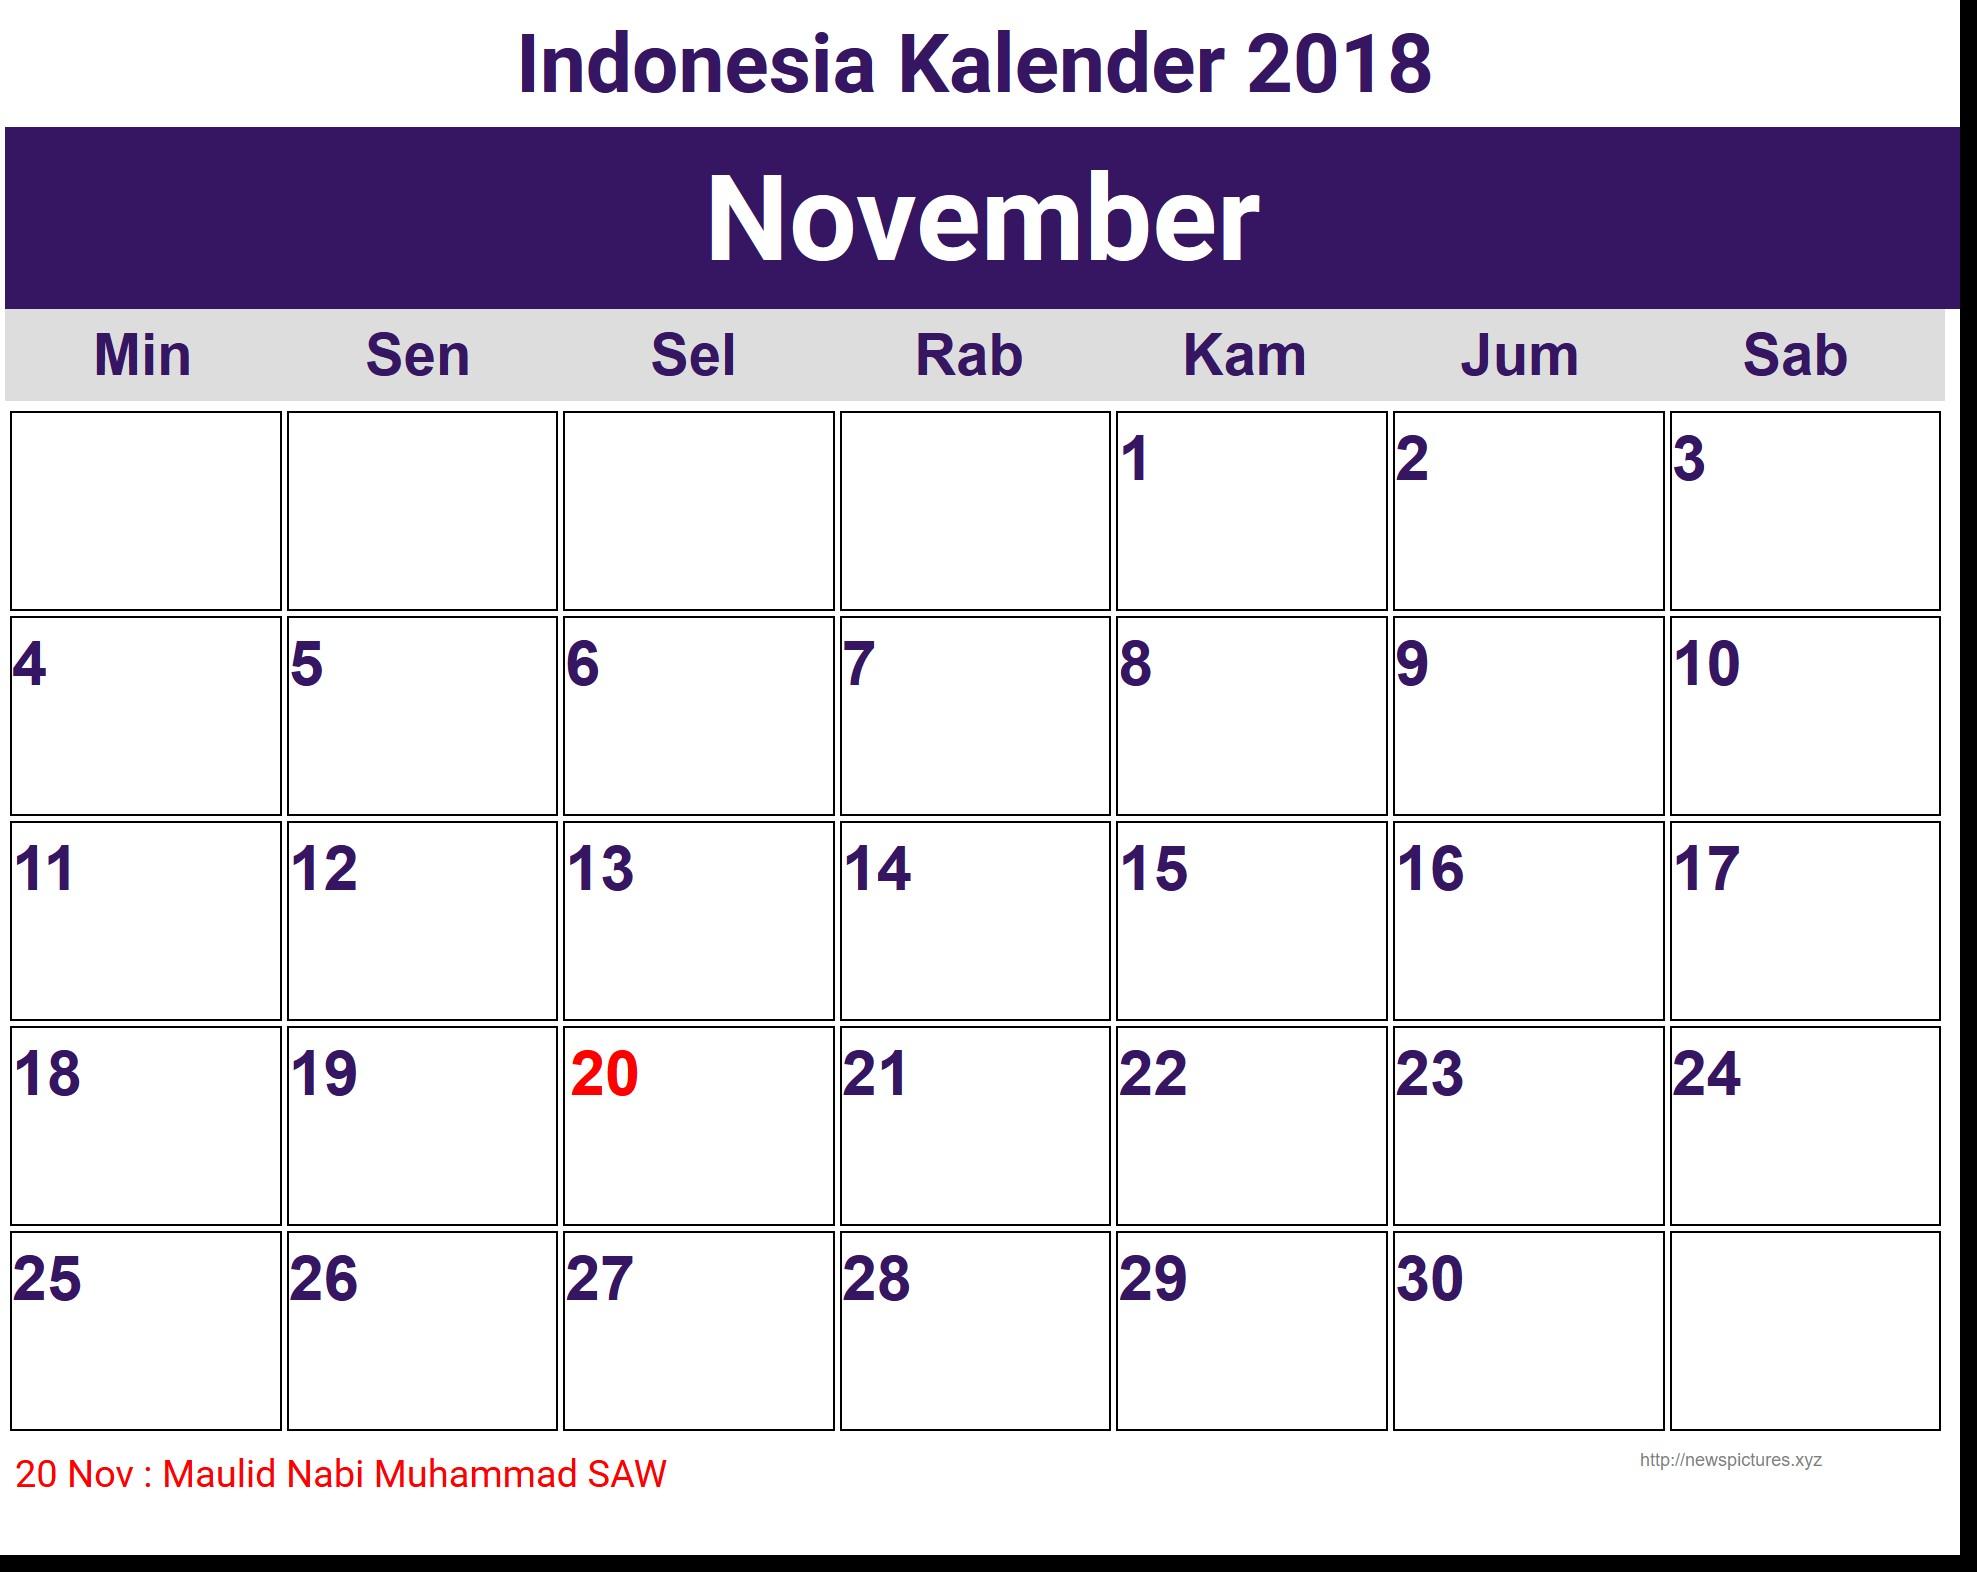 Calendario Perpetuo Para Imprimir En Blanco Más Recientemente Liberado Image for November Indonesia Kalender 2018 Kalender Of Calendario Perpetuo Para Imprimir En Blanco Más Arriba-a-fecha Blend Calendario Para Escribir — Blendiberia